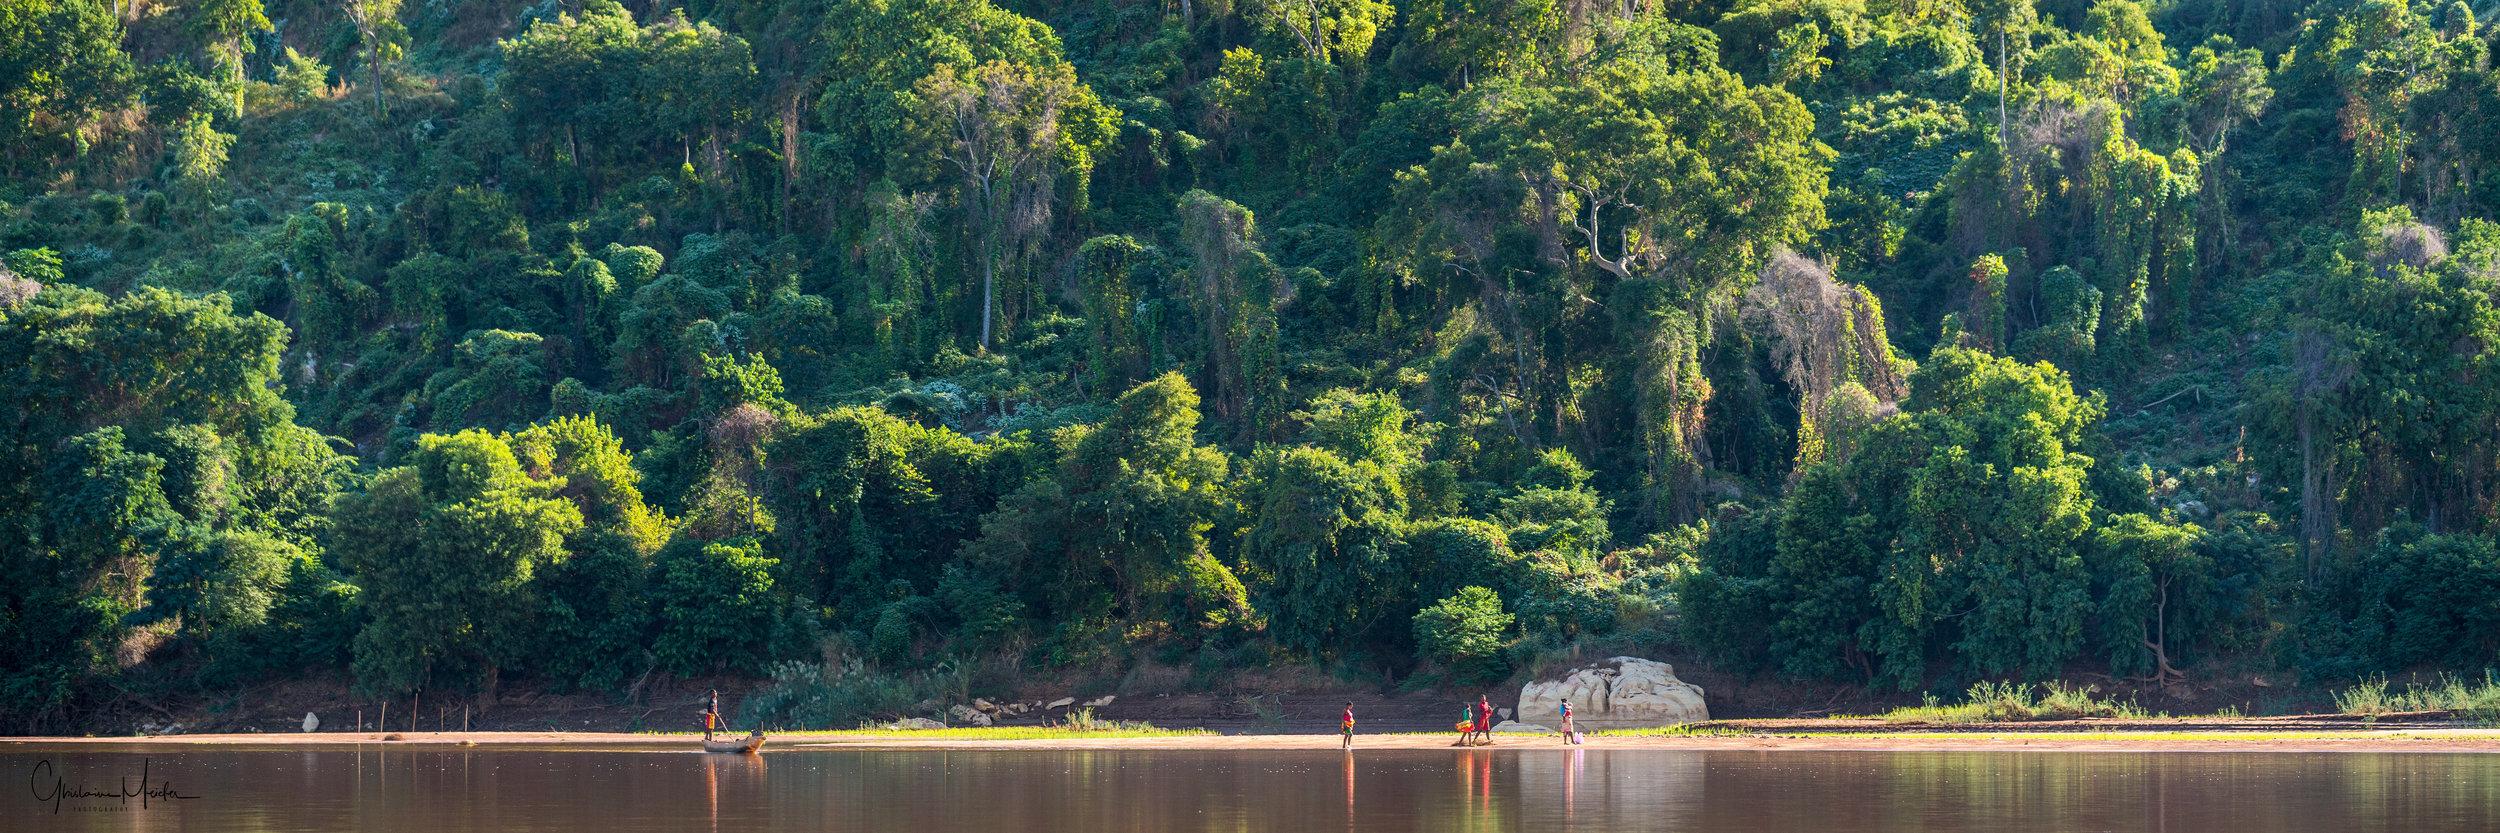 Madagascar-9480.jpg